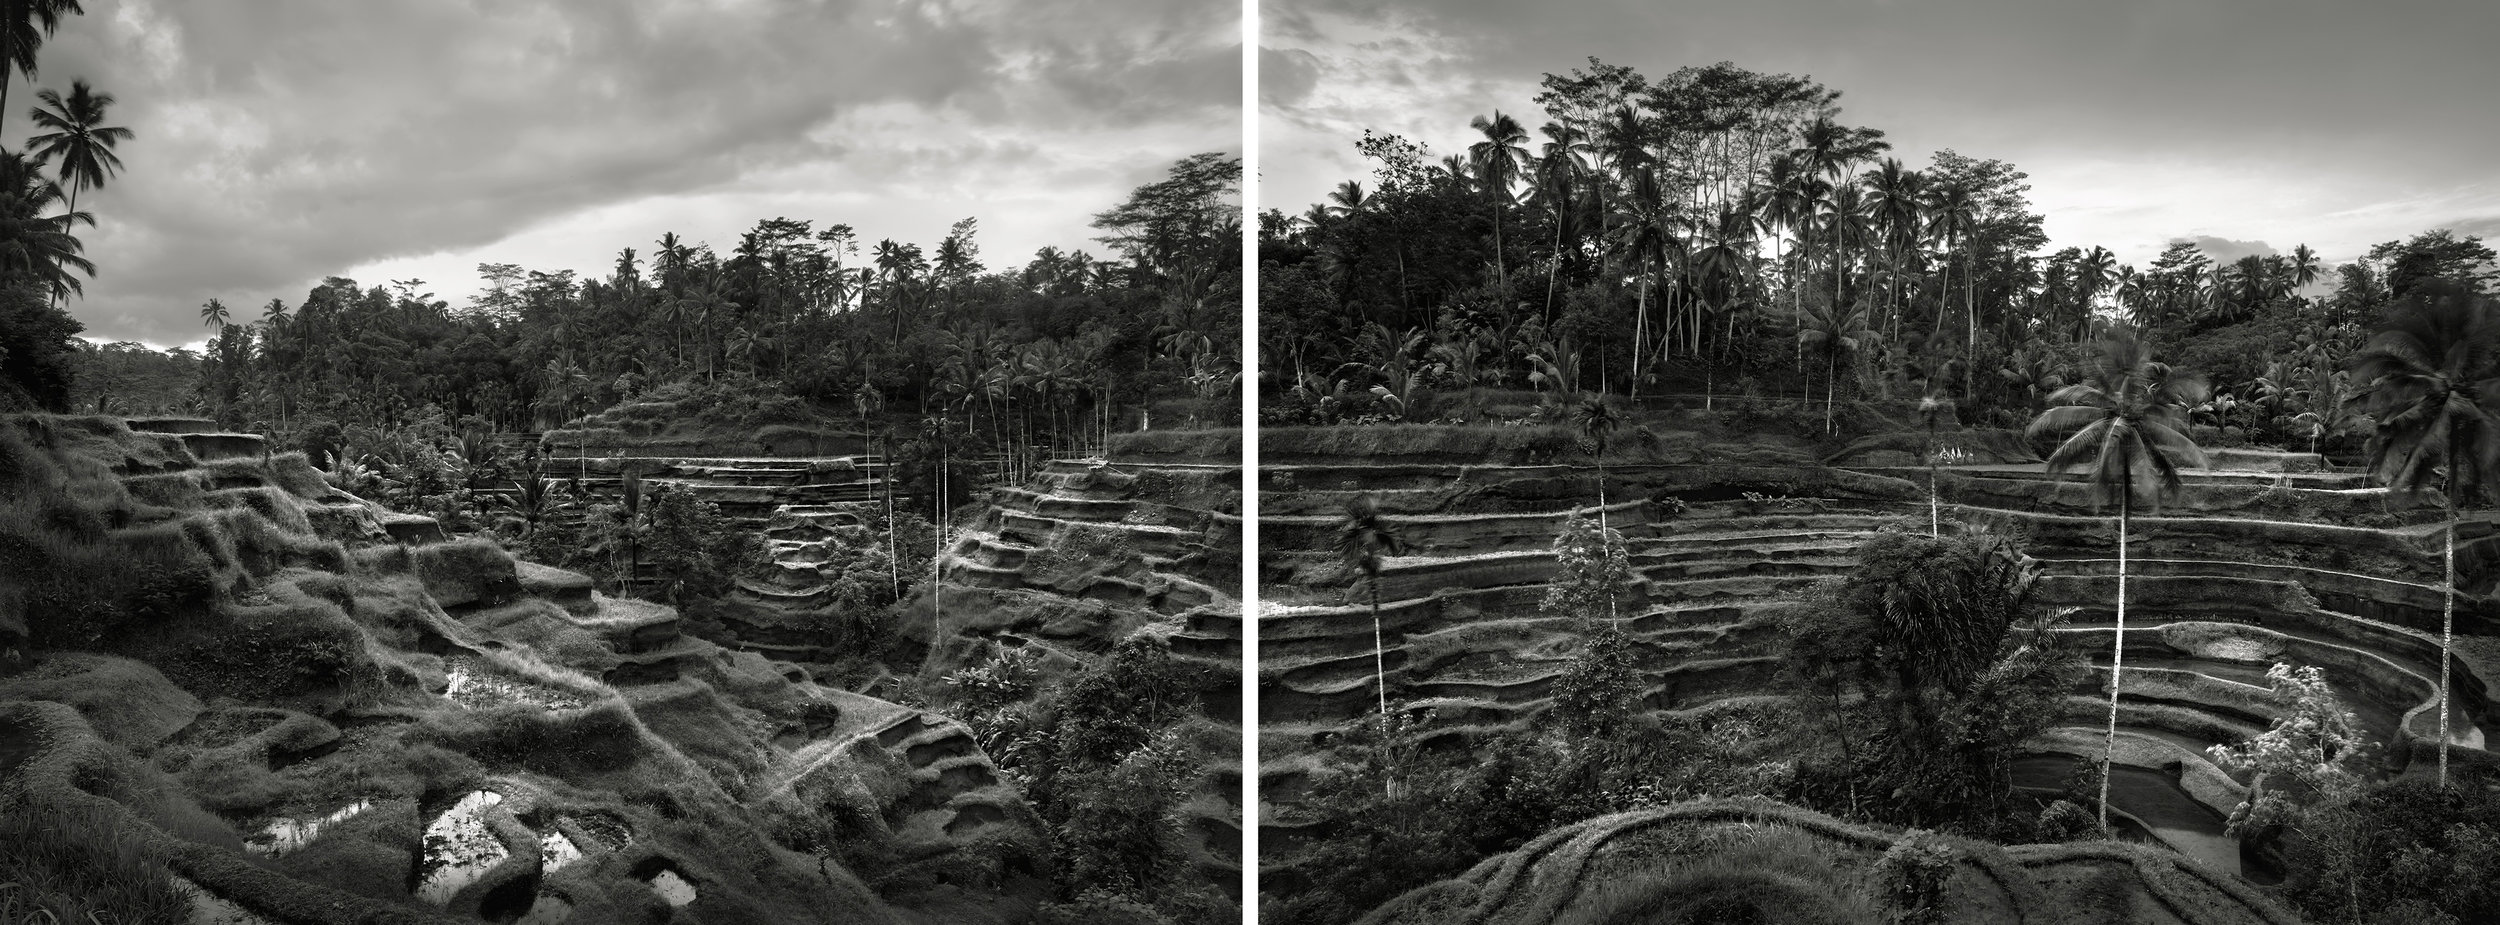 Ubud Terraces, Bali, Indonesia - 2006 (diptych) copy.jpg